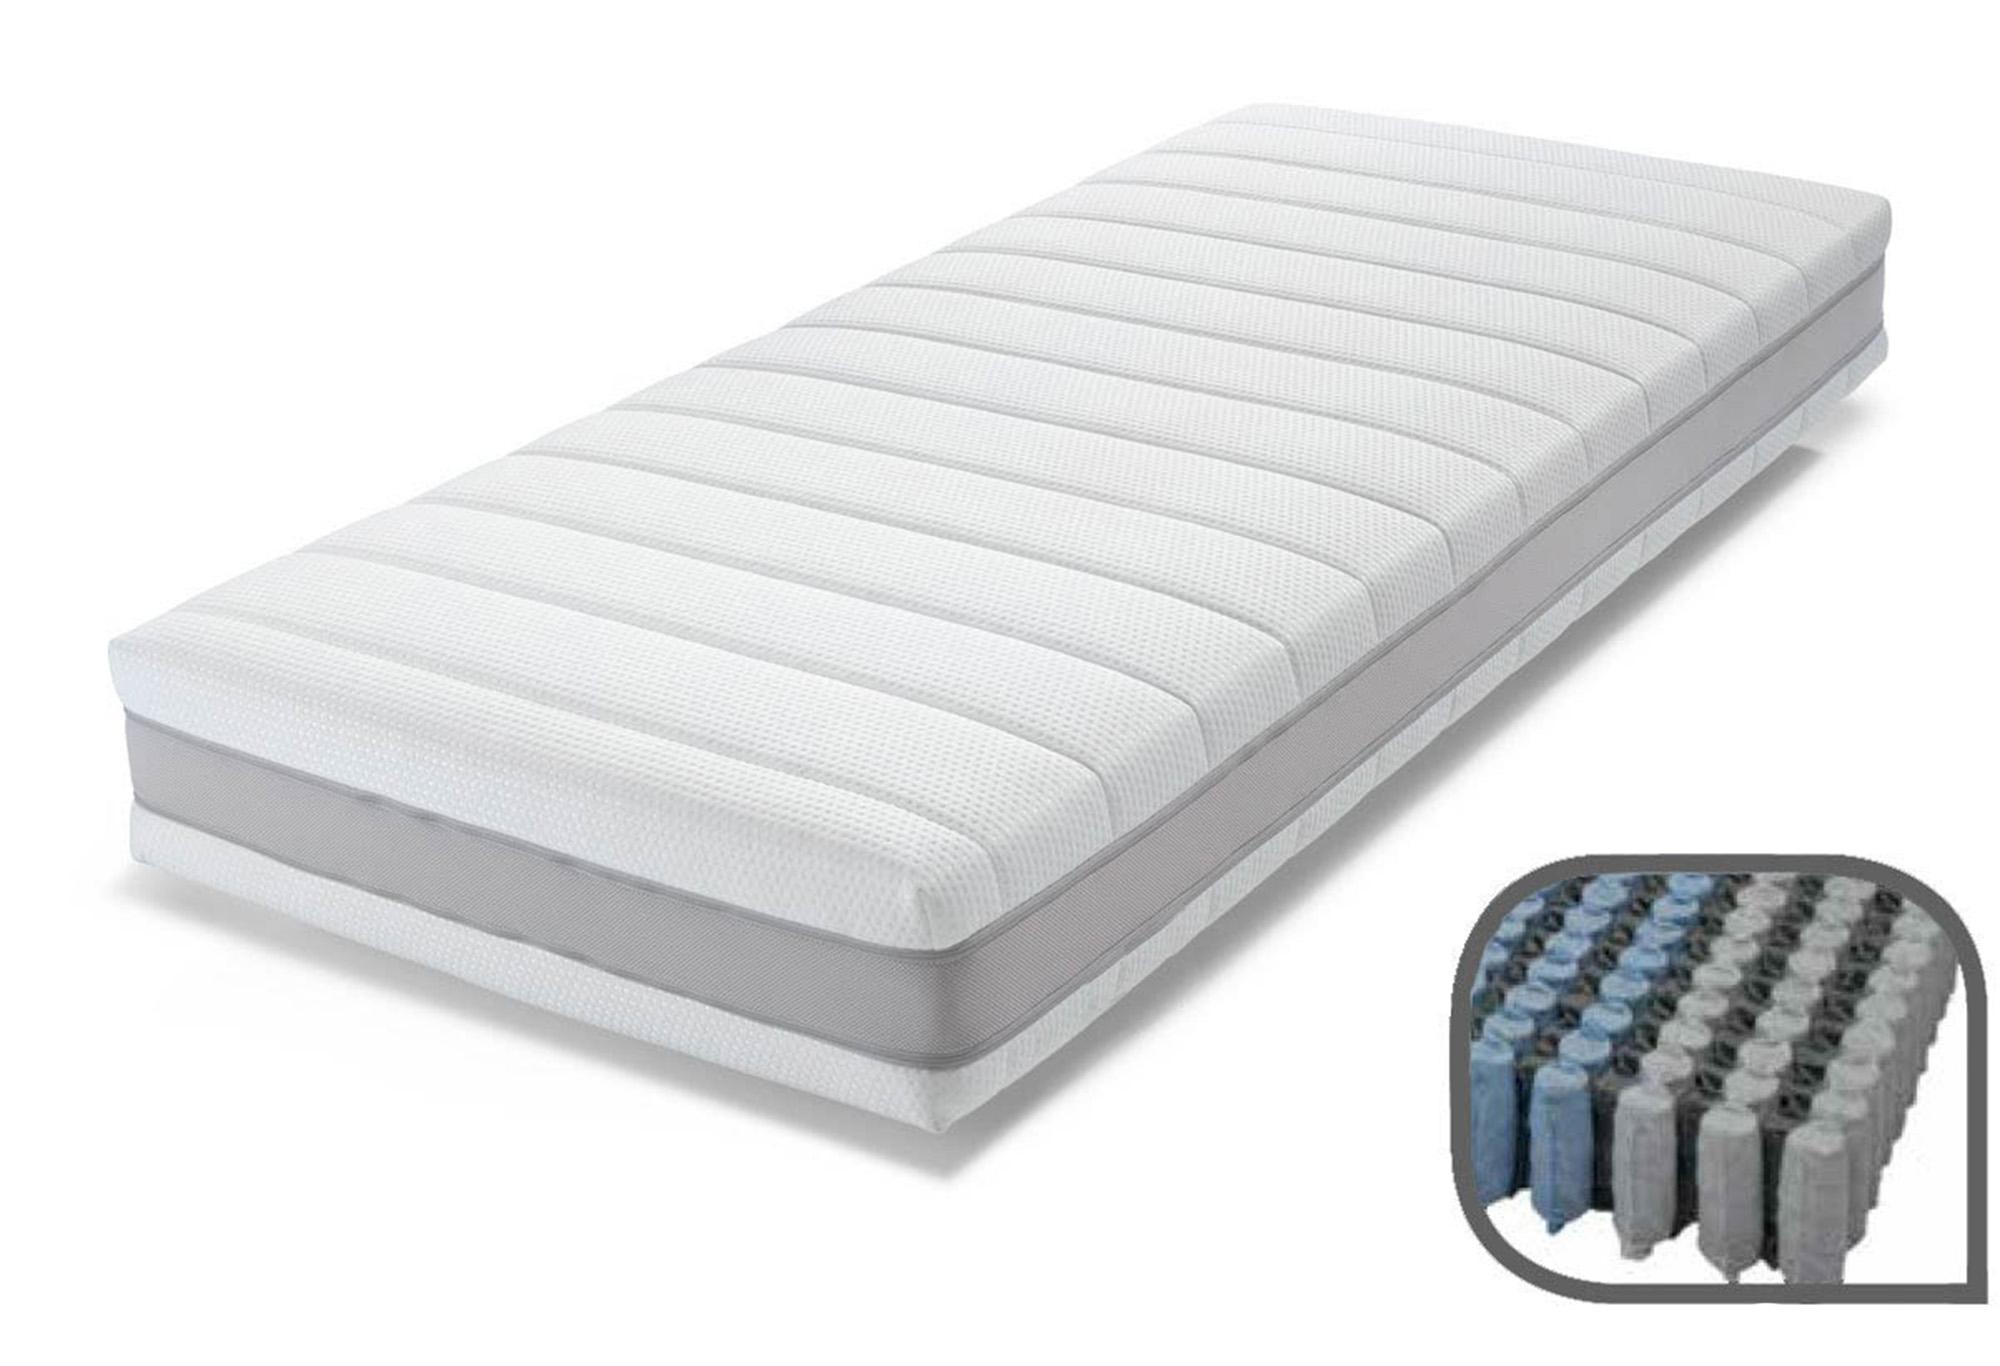 matras kopen 120x200 beautiful talalay latex matras uclassic softu x with matras kopen 120x200. Black Bedroom Furniture Sets. Home Design Ideas